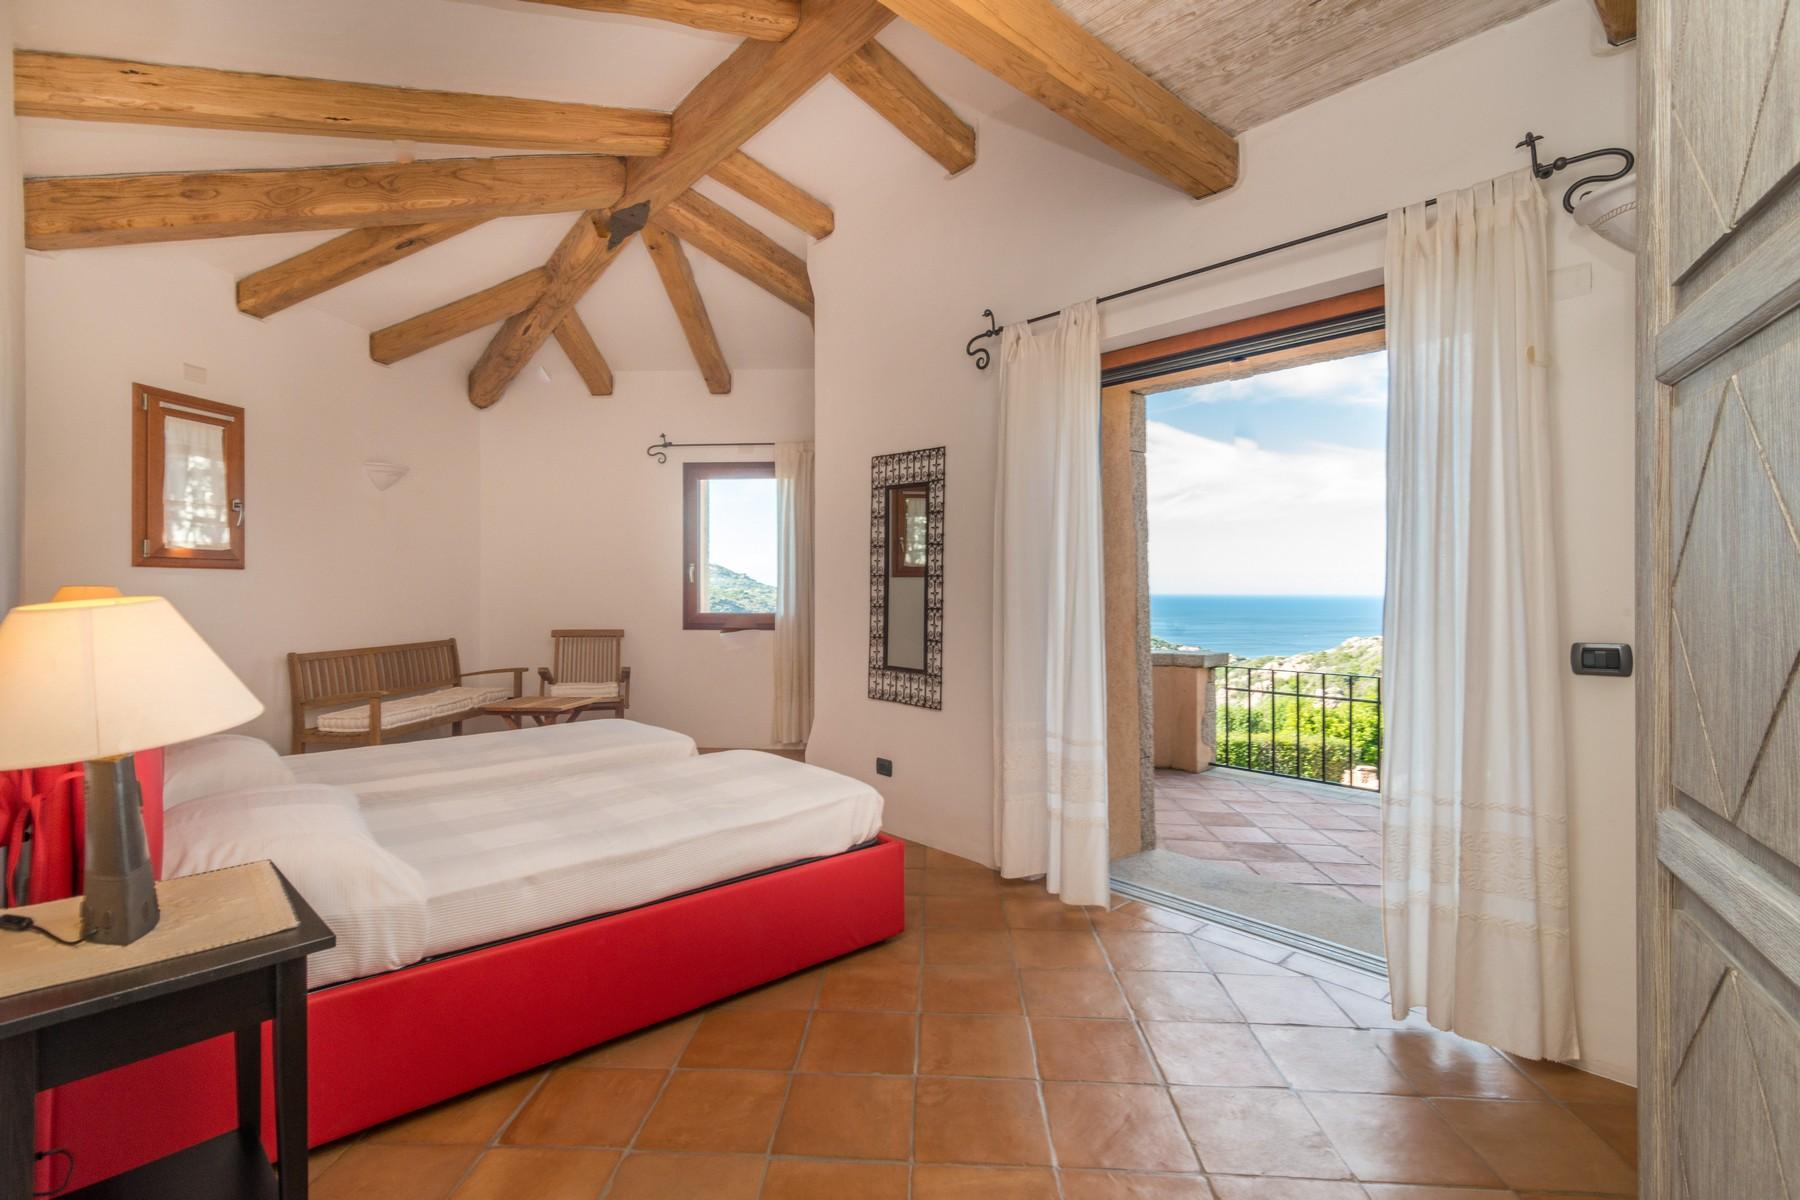 Porto Cervo Abbiadori Splendide villa jumelée avec vue sur le golfe de Pevero - 26